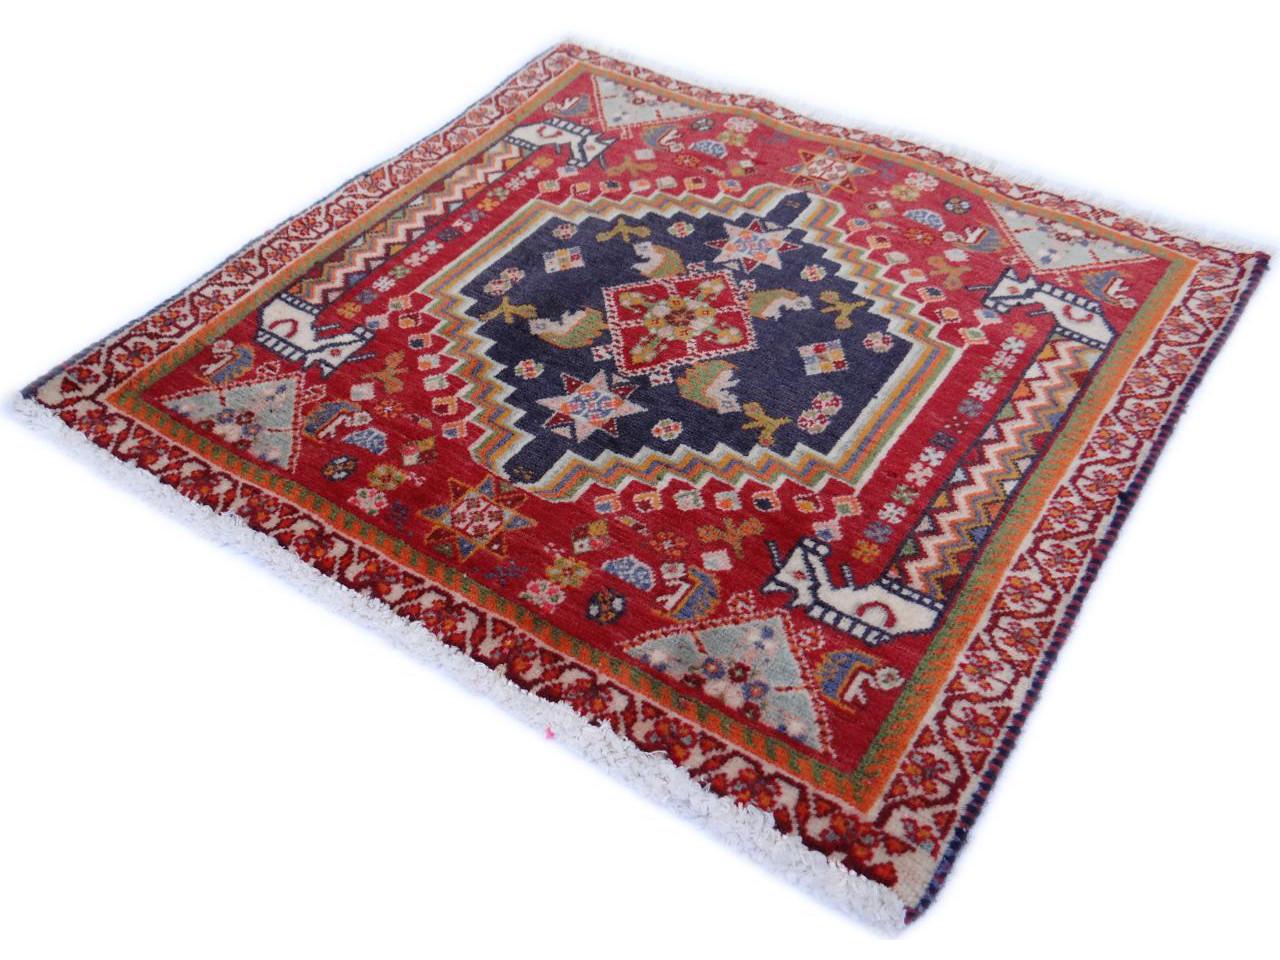 gashgai fin tapis persans n 2369 58x54cm. Black Bedroom Furniture Sets. Home Design Ideas